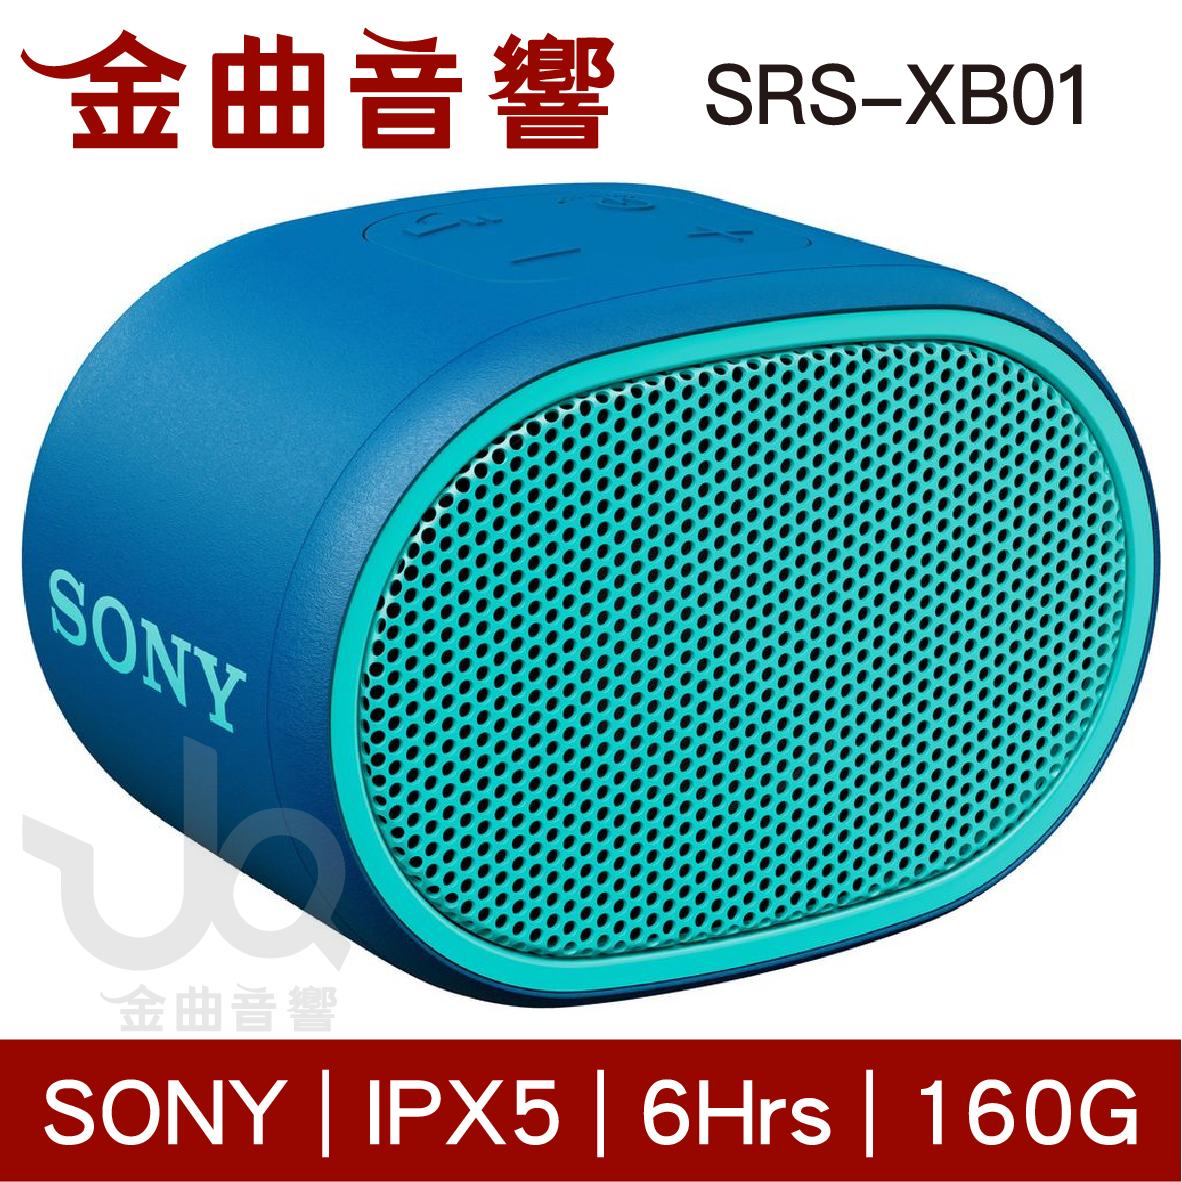 SONY 可攜行藍牙喇叭 SRS-XB01 藍 ( 防潑水 可攜行 重低音 藍牙 喇叭 XB01) | 金曲音響